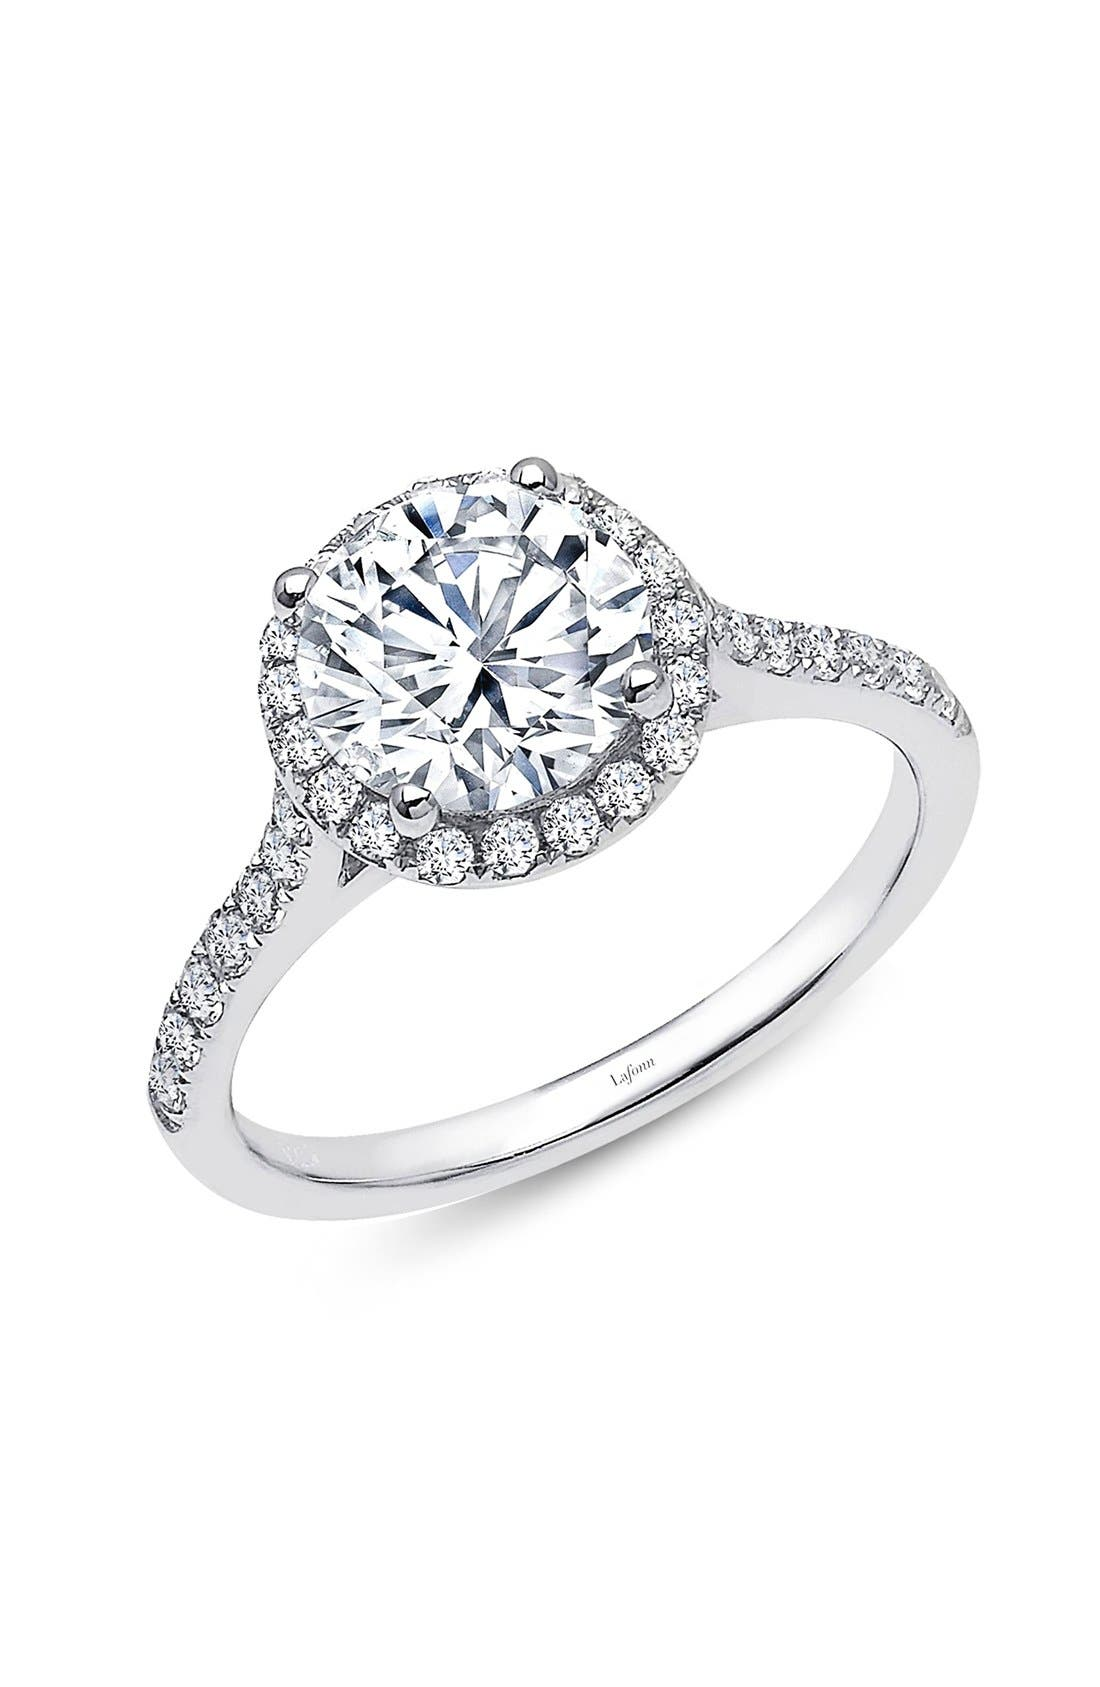 Lafonn 'Lassaire' Round Halo Ring